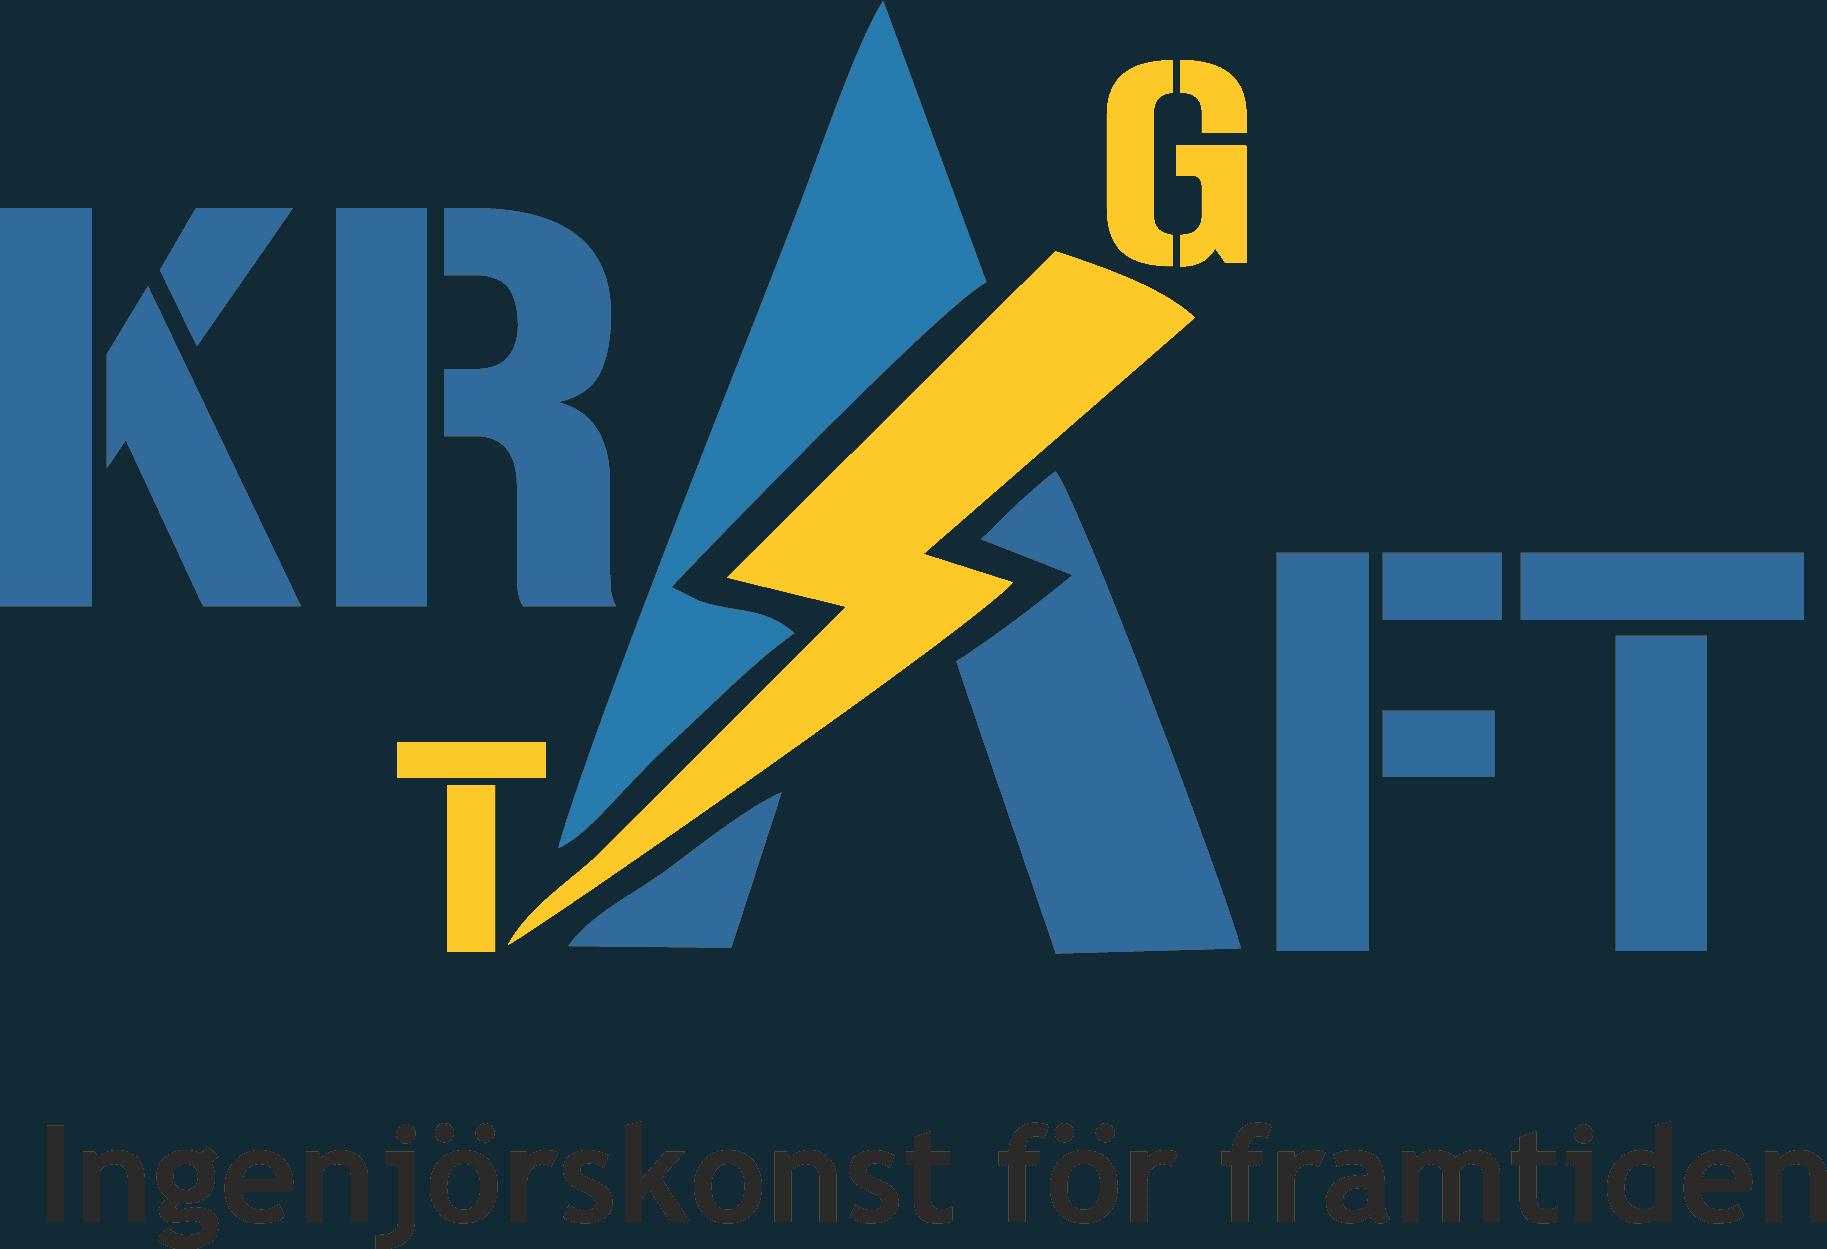 Logotyp för Krafttag AB